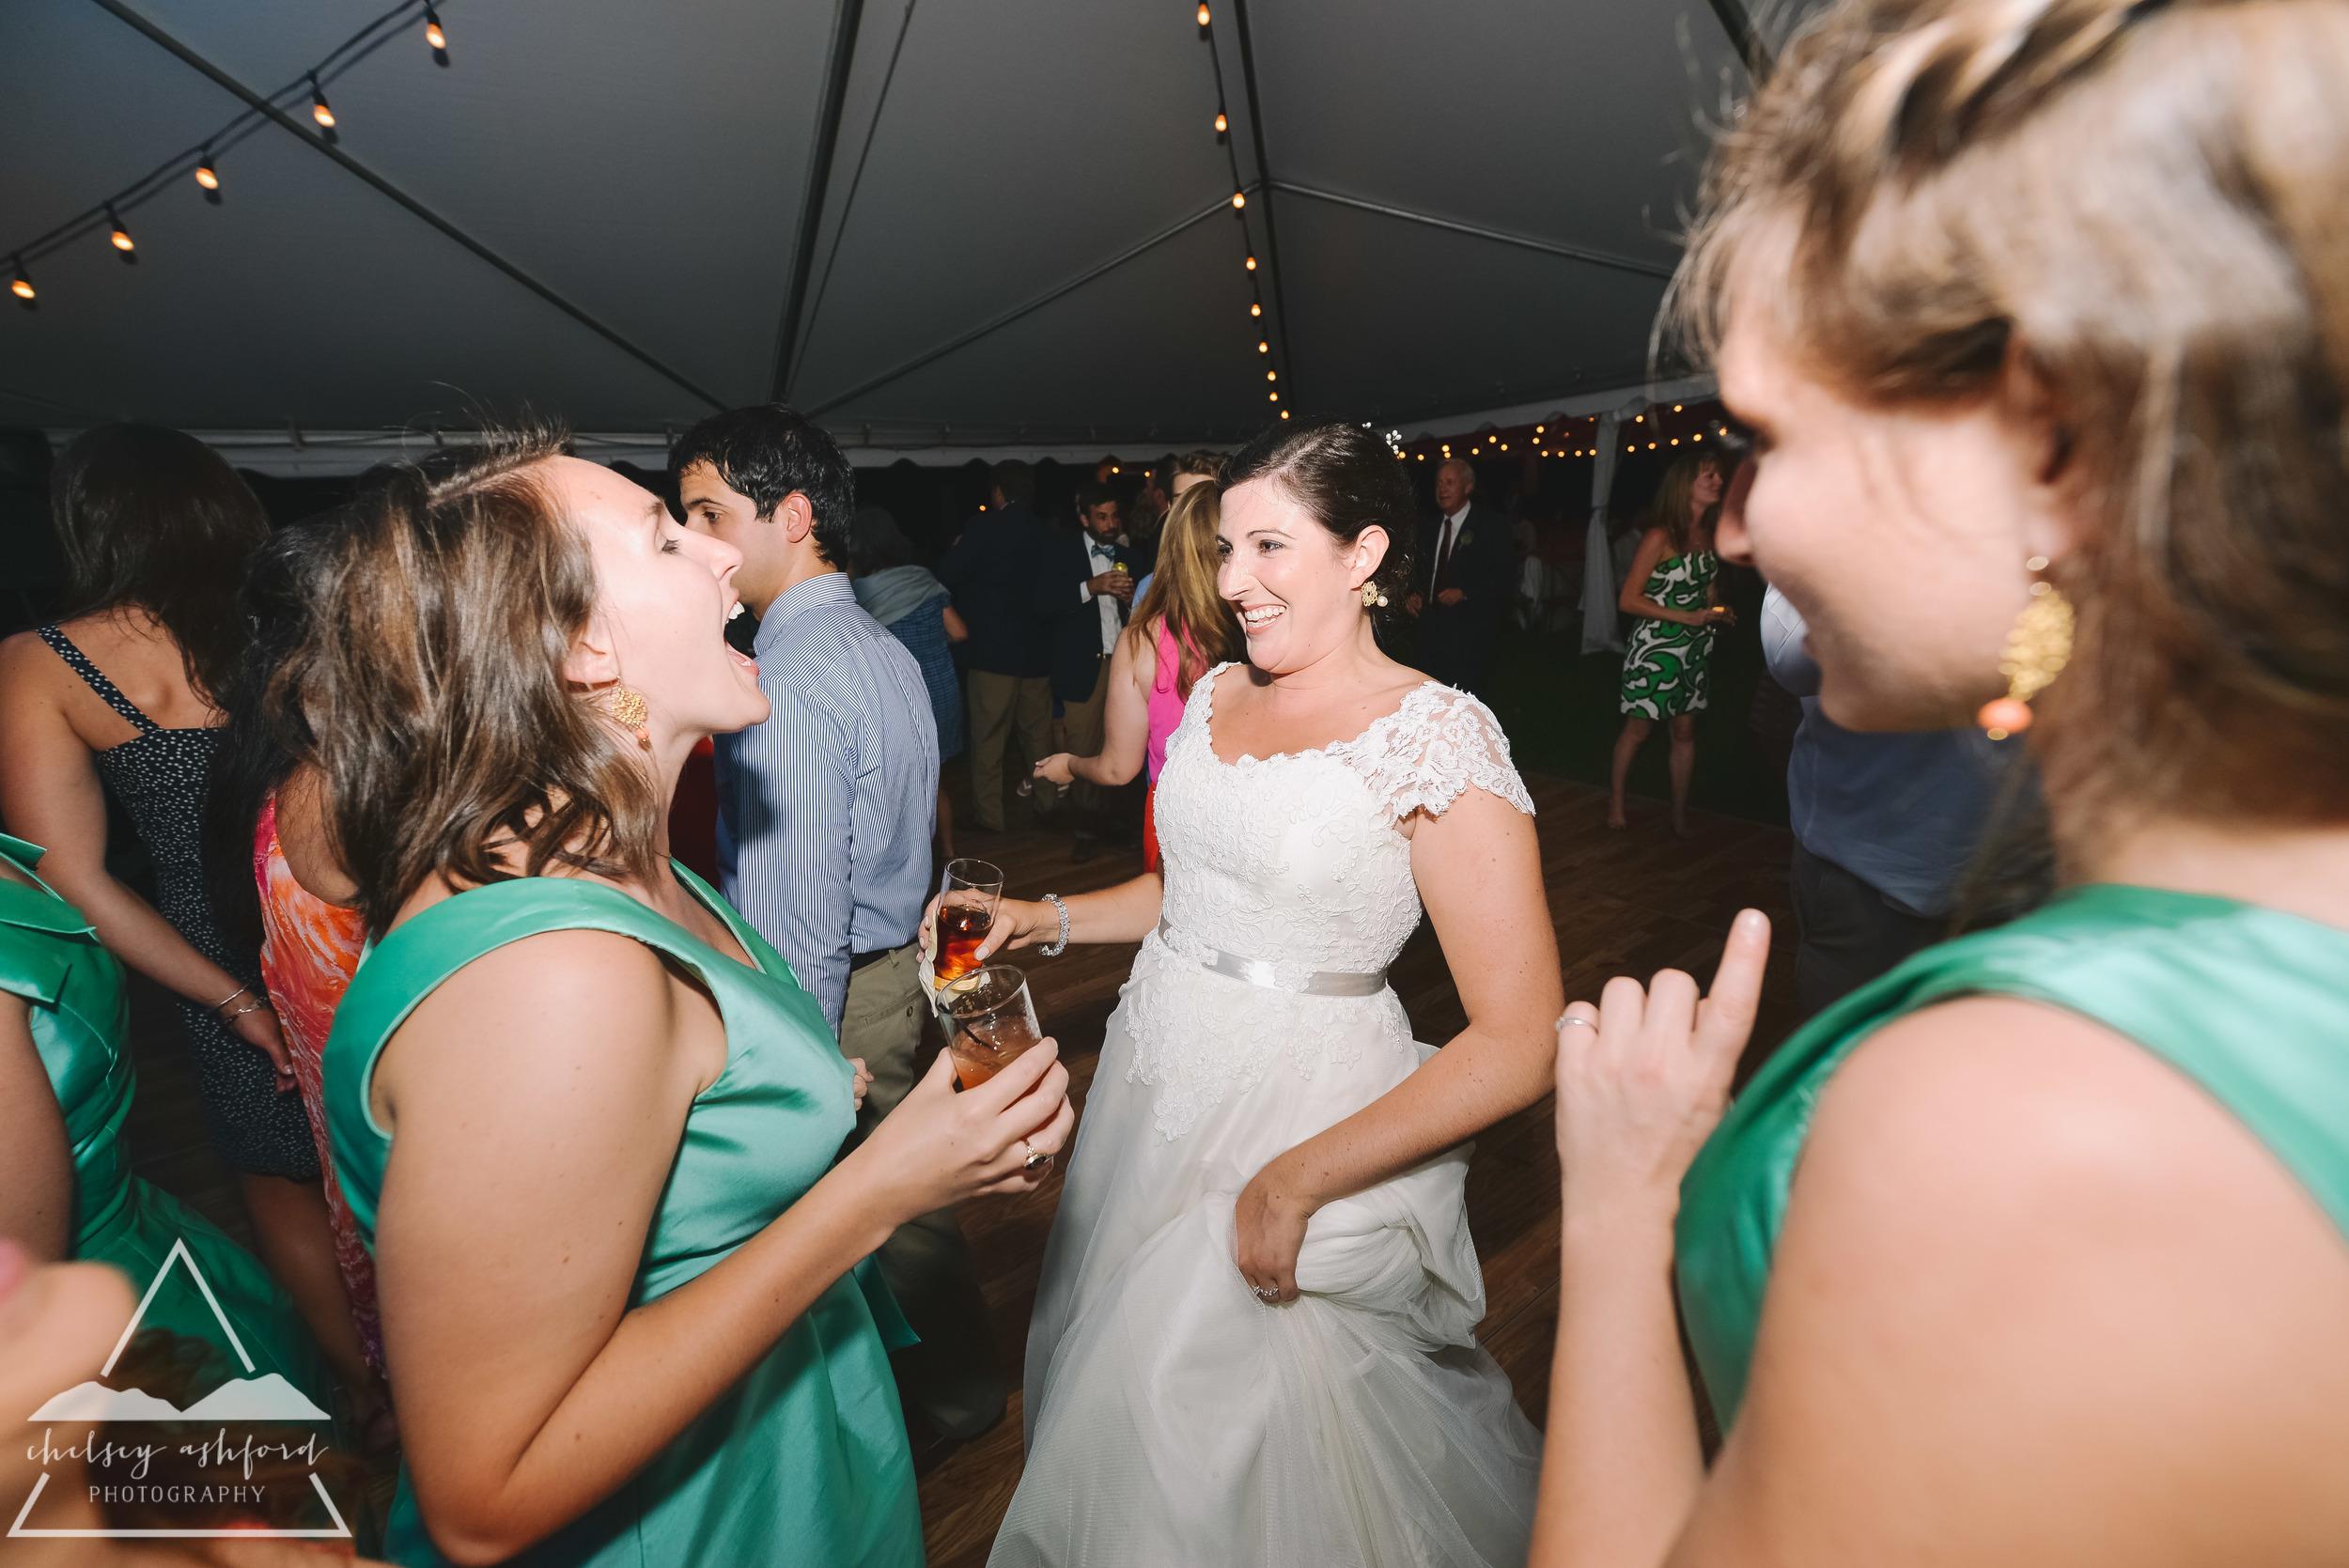 Clarkson_wedding_web-206.jpg